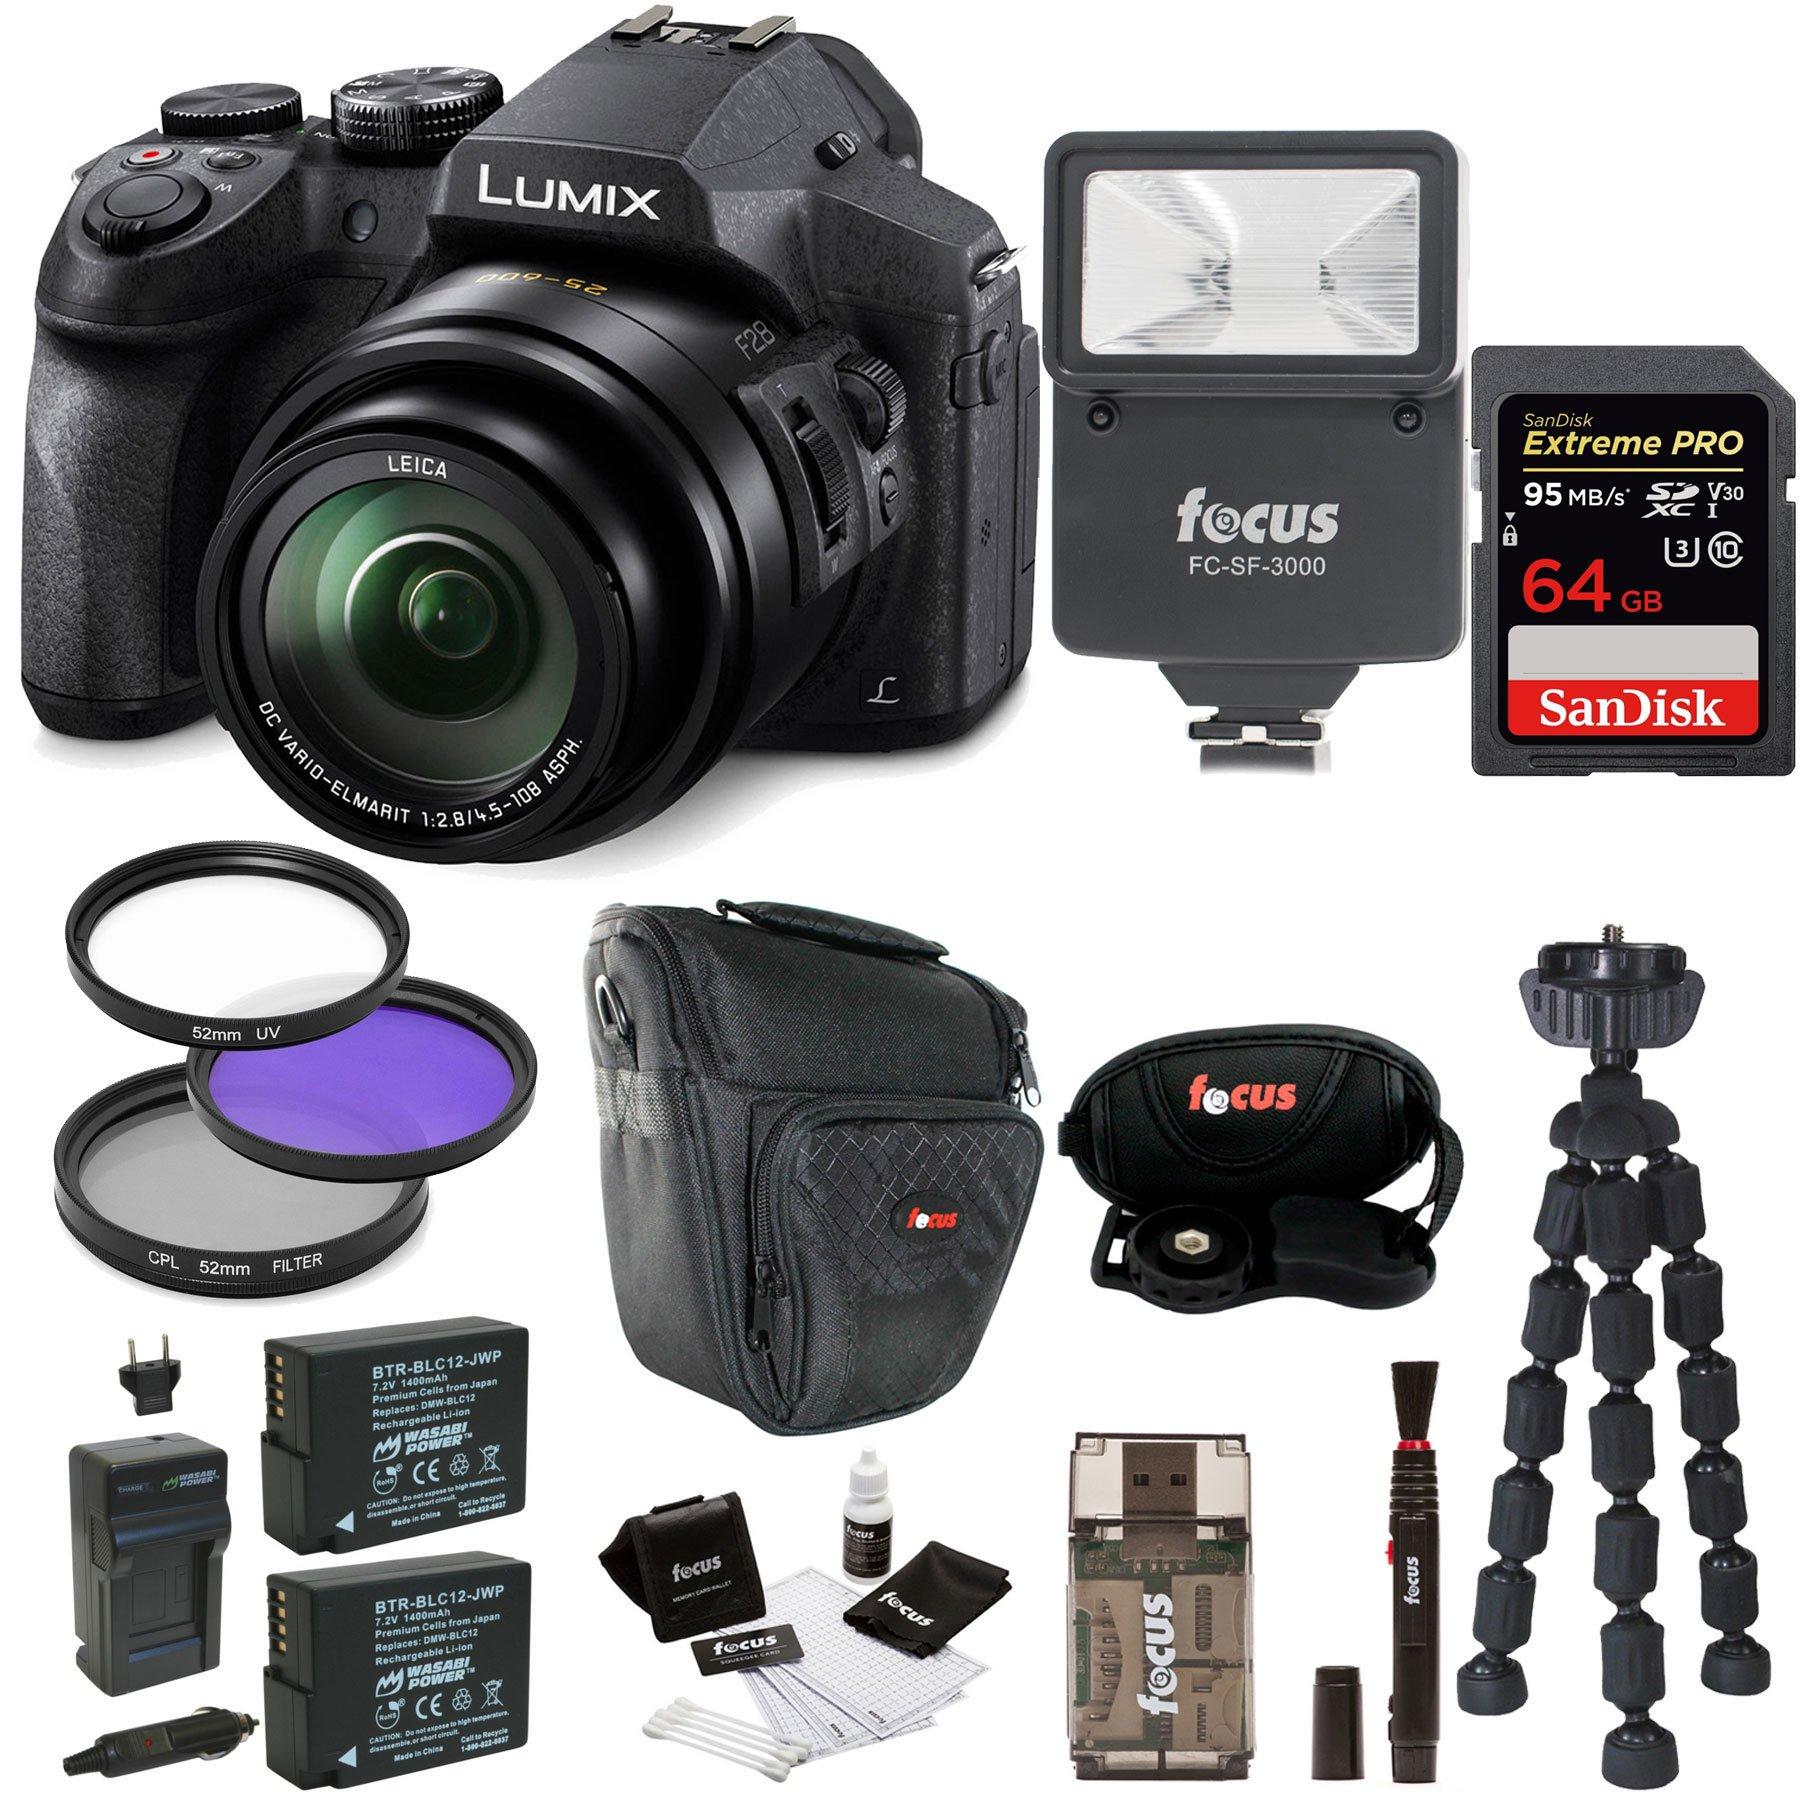 Panasonic DMC-FZ300K Digital Camera with Digital Slave Flash and 64GB Card Bundle